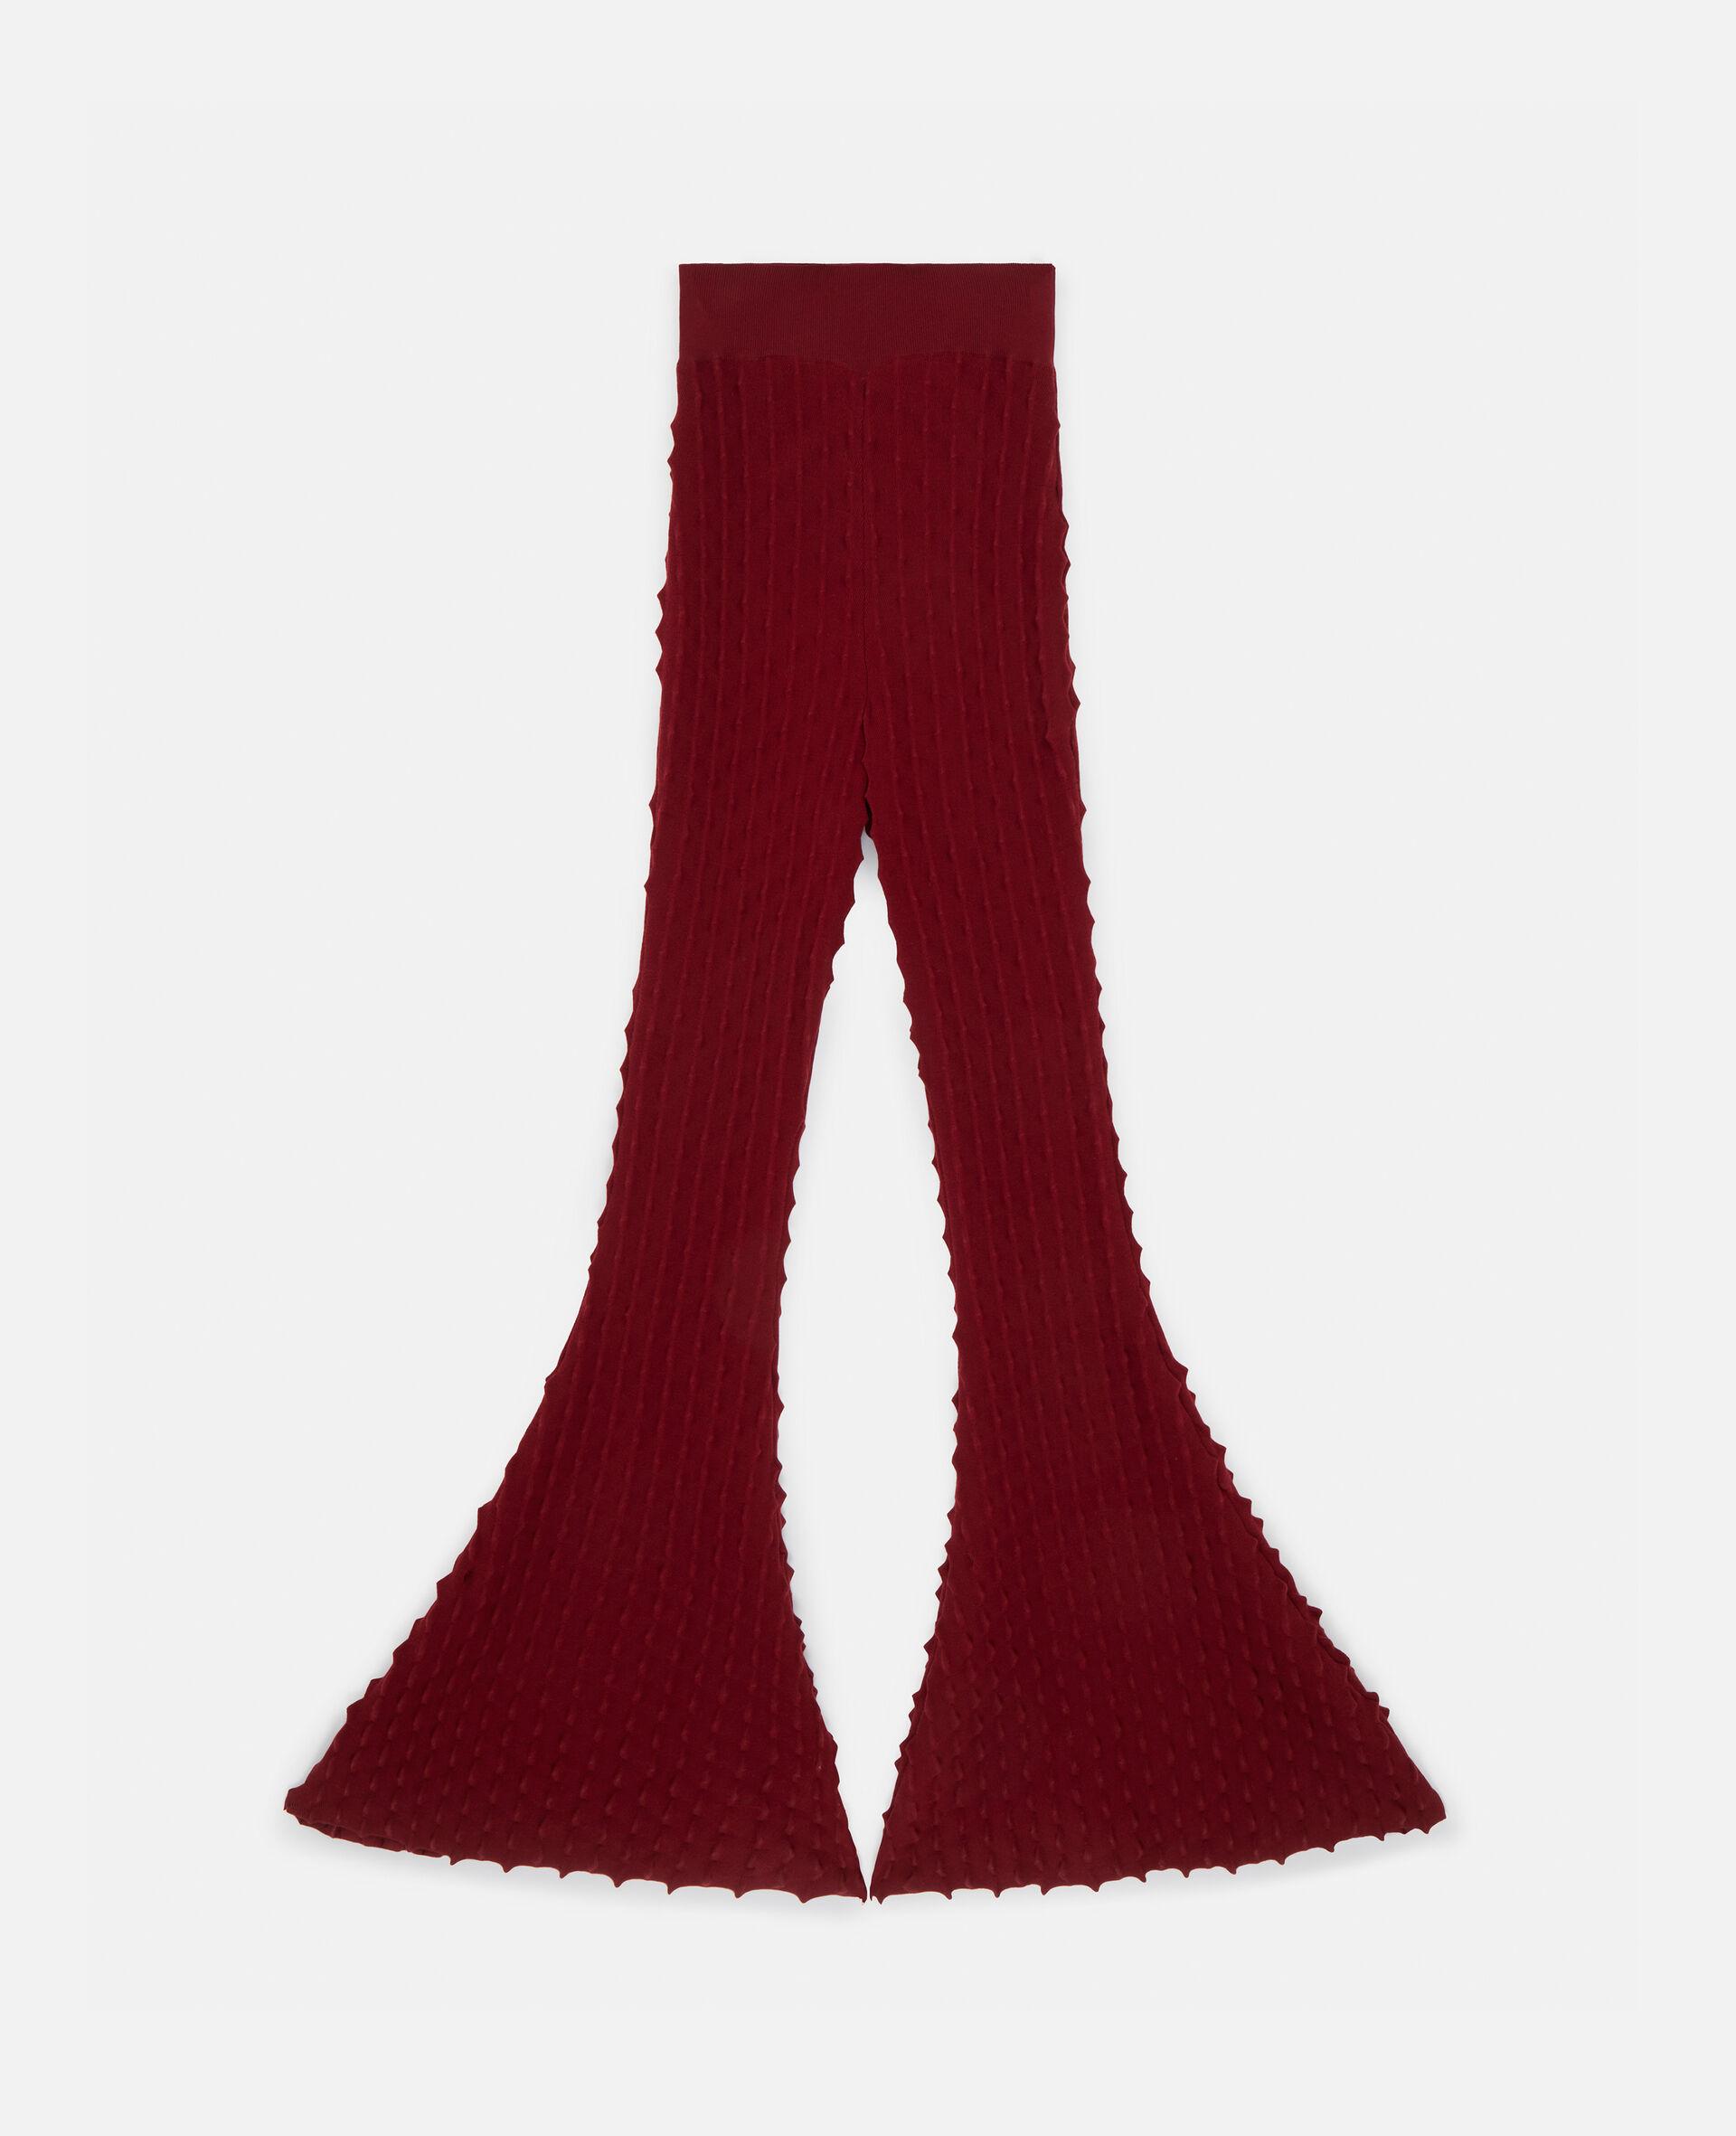 Pantalon Light Popcorn-Rouge-large image number 0